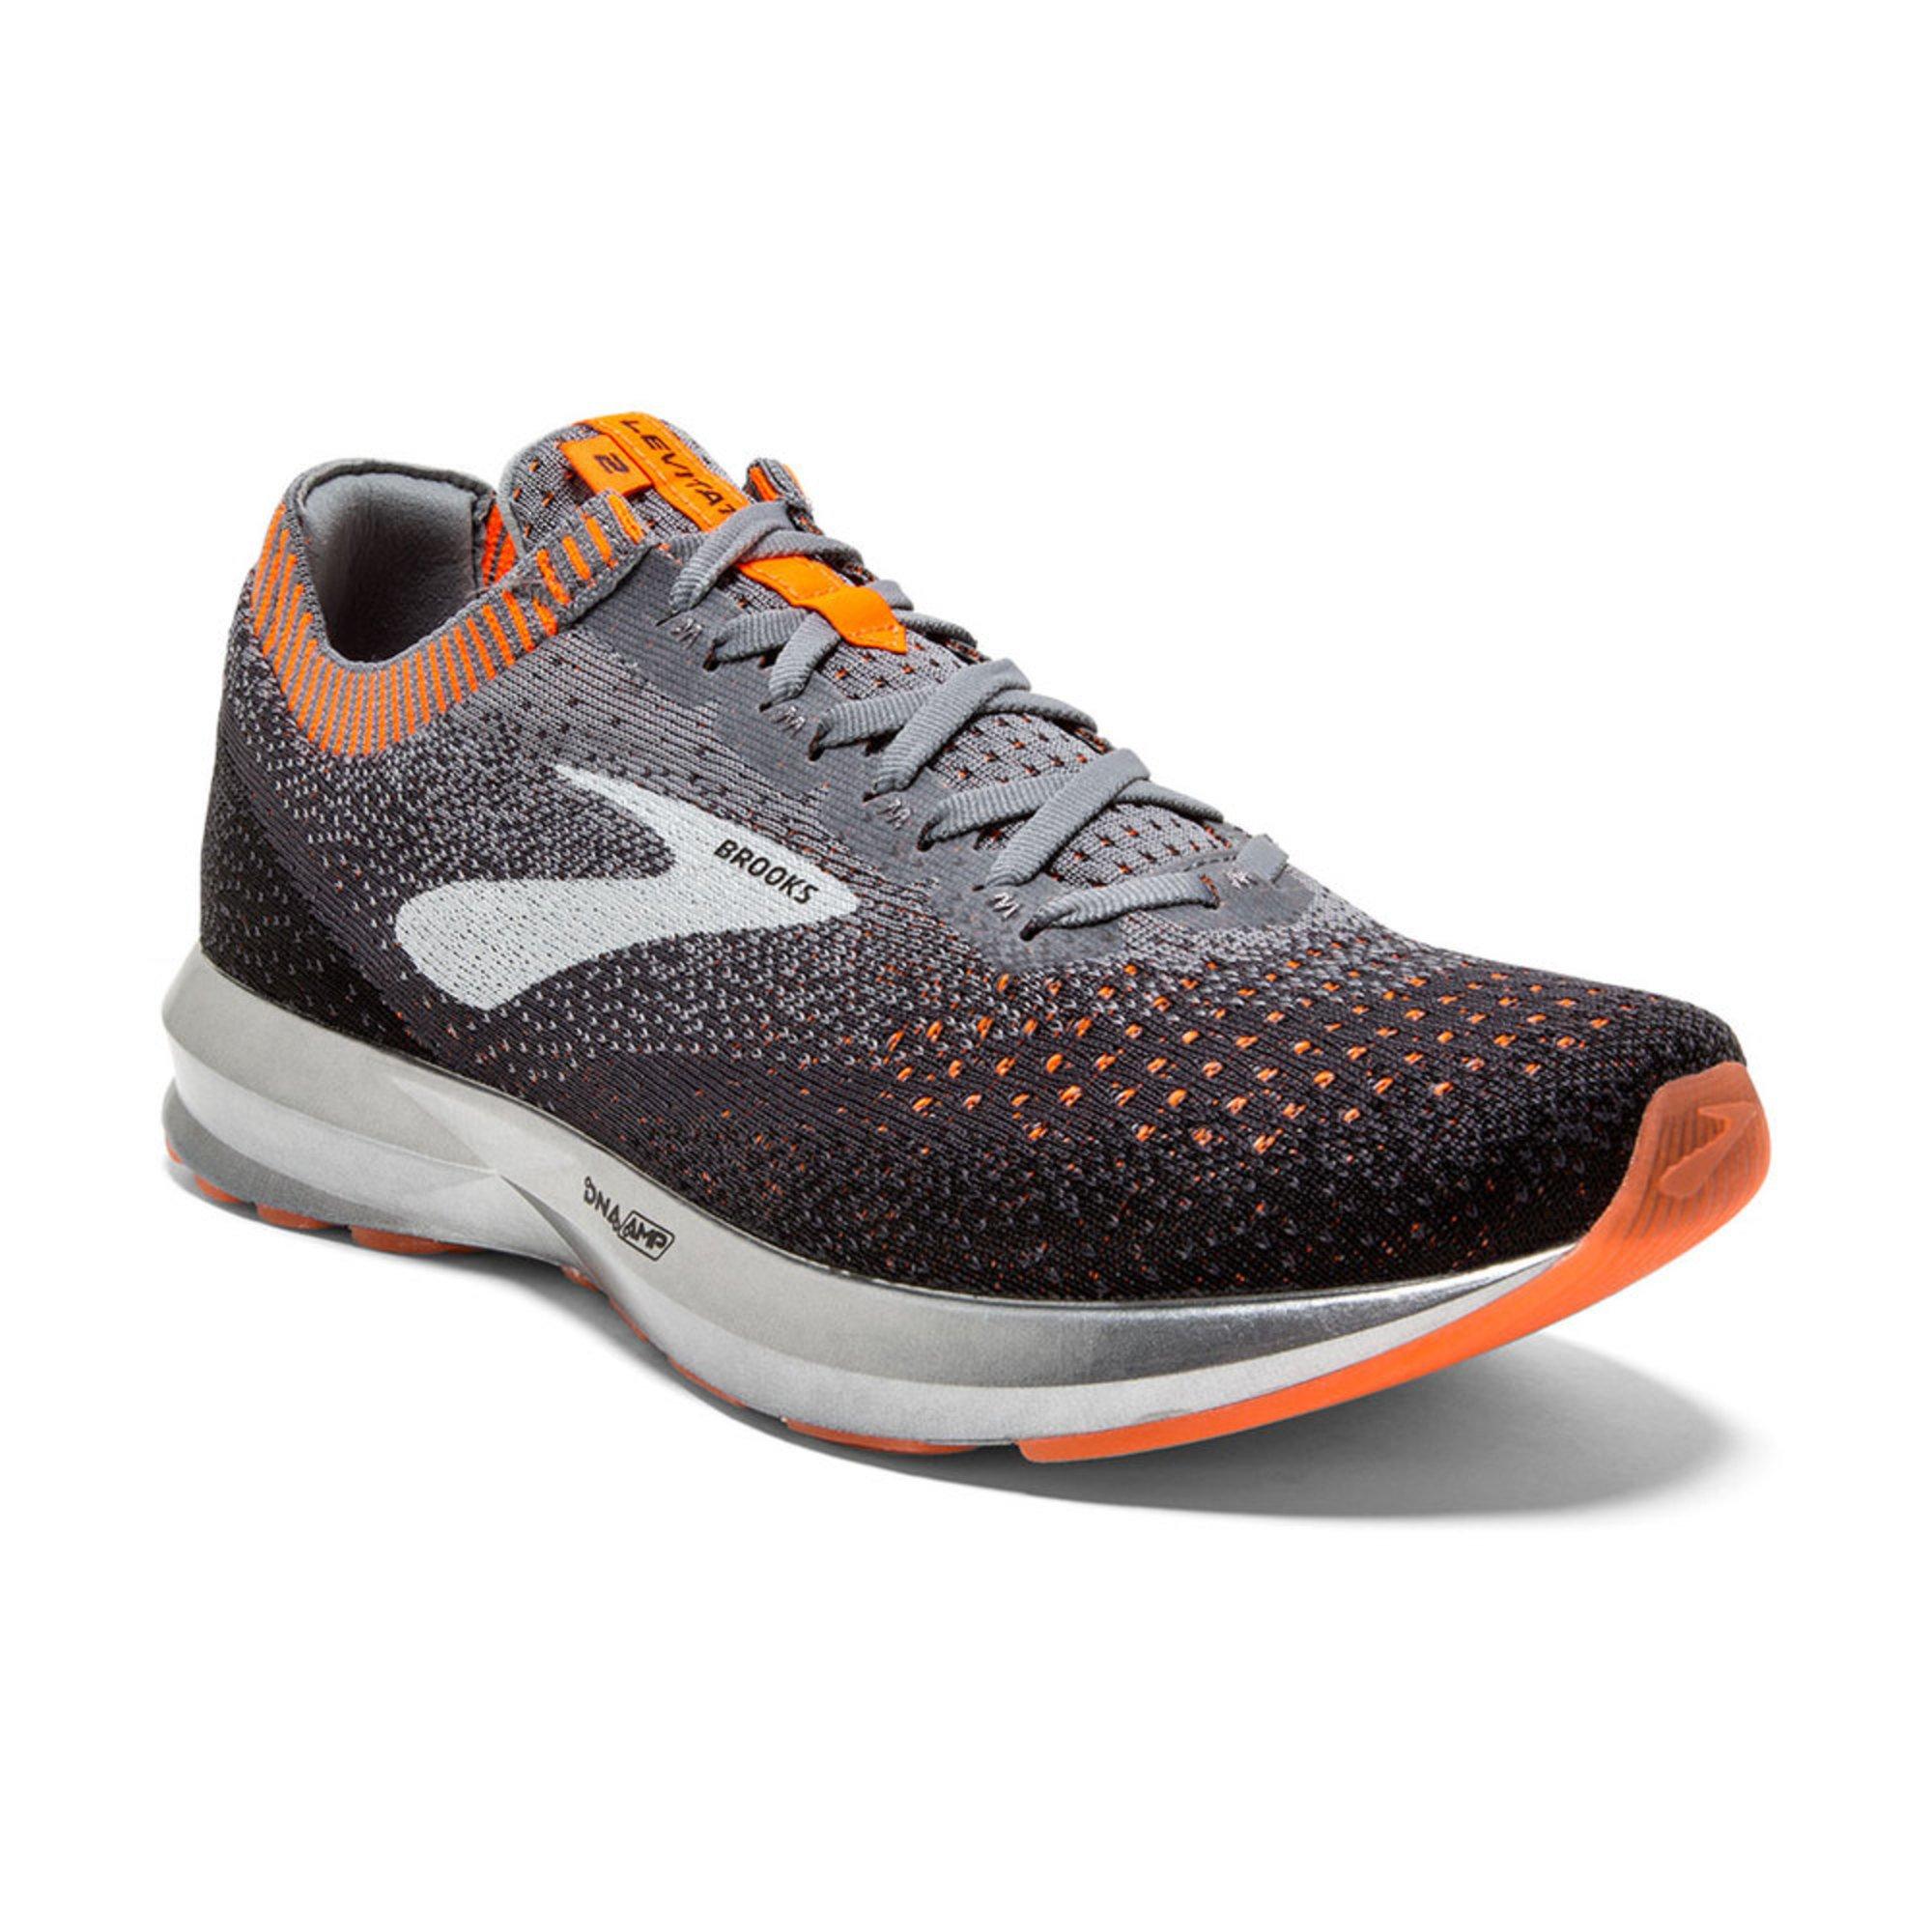 cc719fecc7b Brooks Men s Levitate 2 Running Shoe